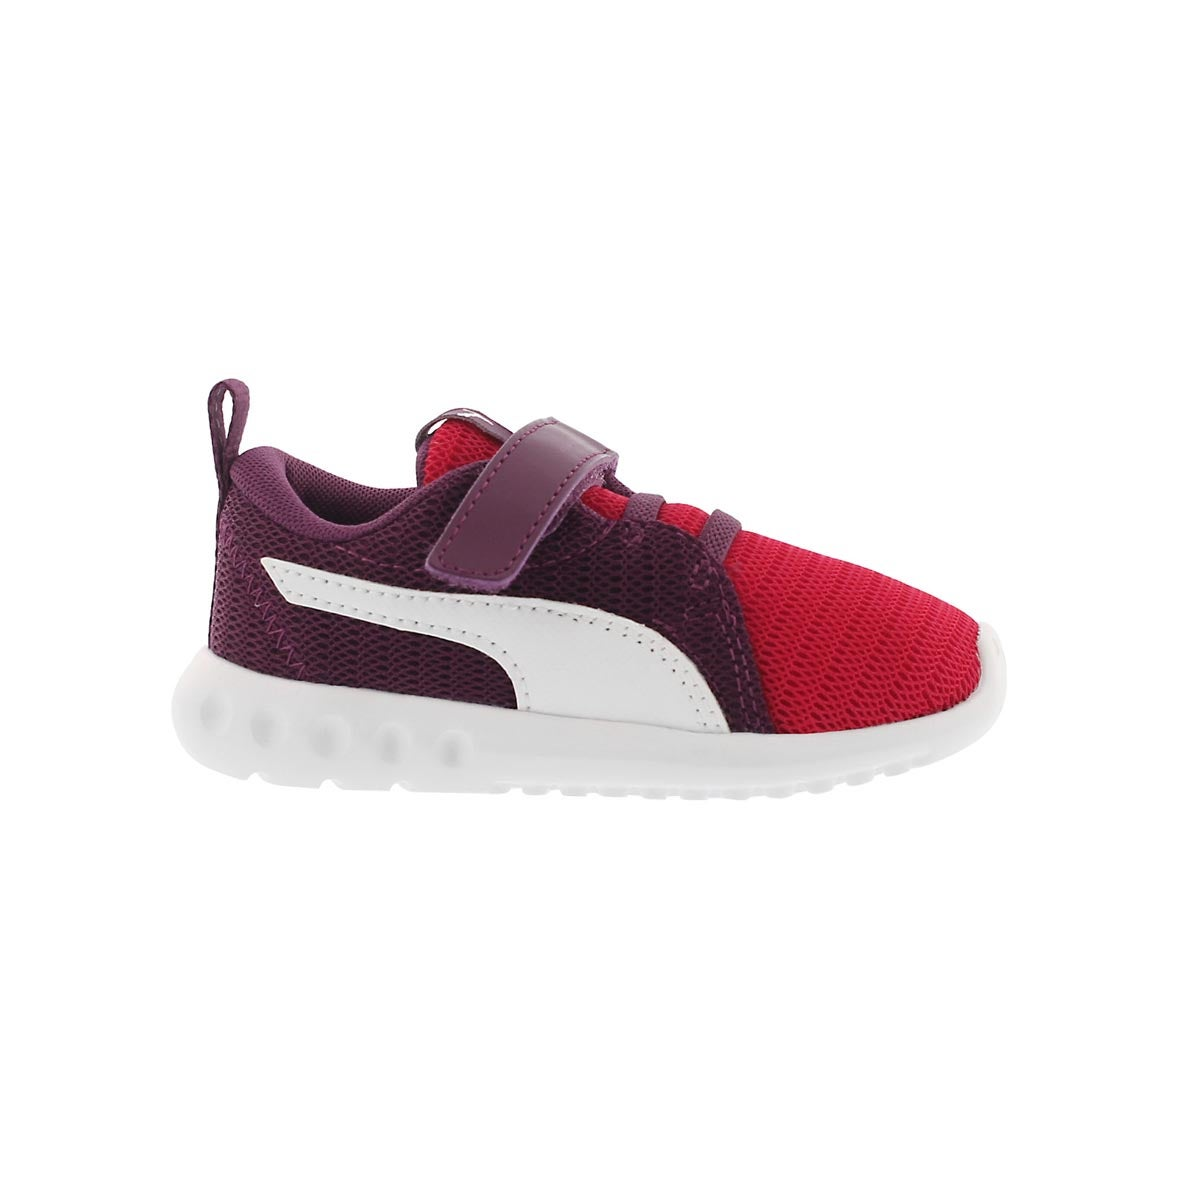 Inf-g Carson 2 V pink sneaker